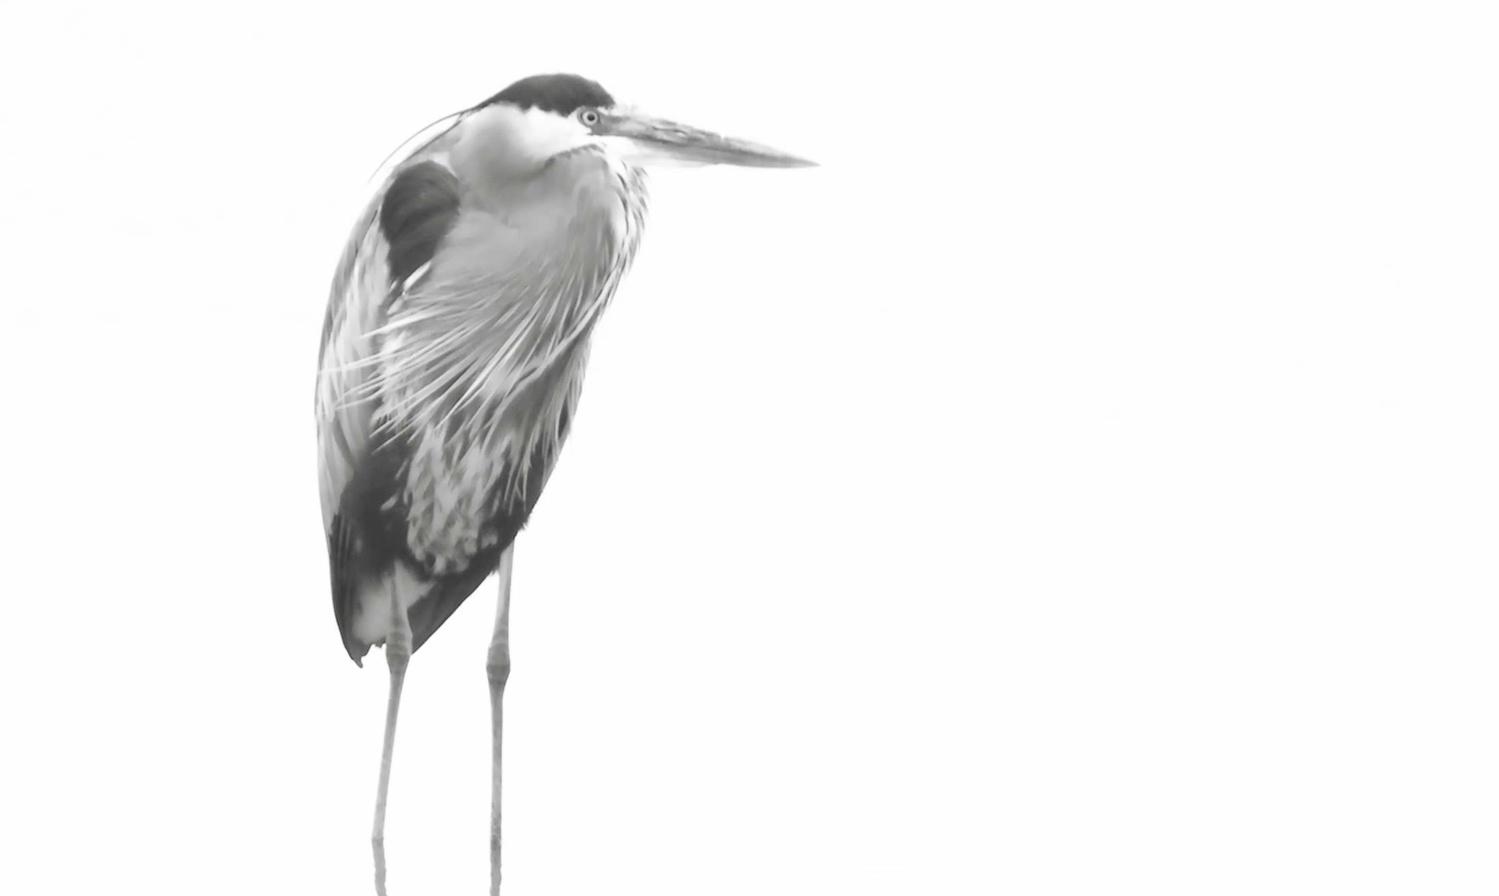 Soft Heron by Ruth Carll